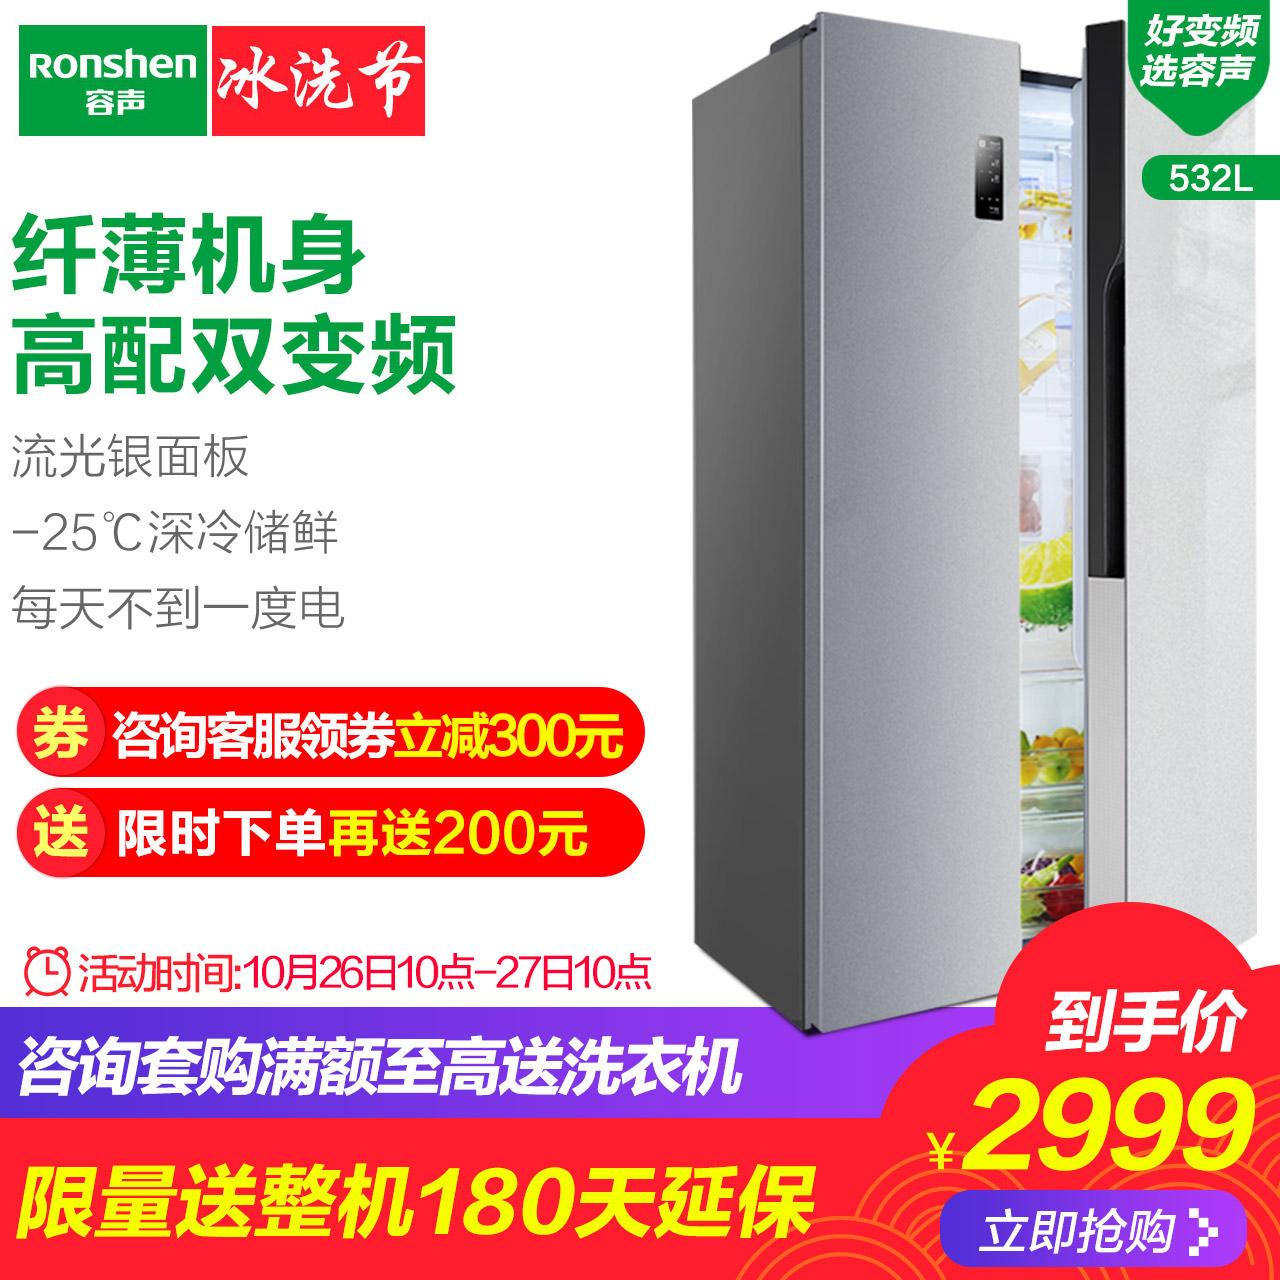 Ronshen/容声 BCD-532WD11HP电冰箱双门对开门家用变频风冷无霜